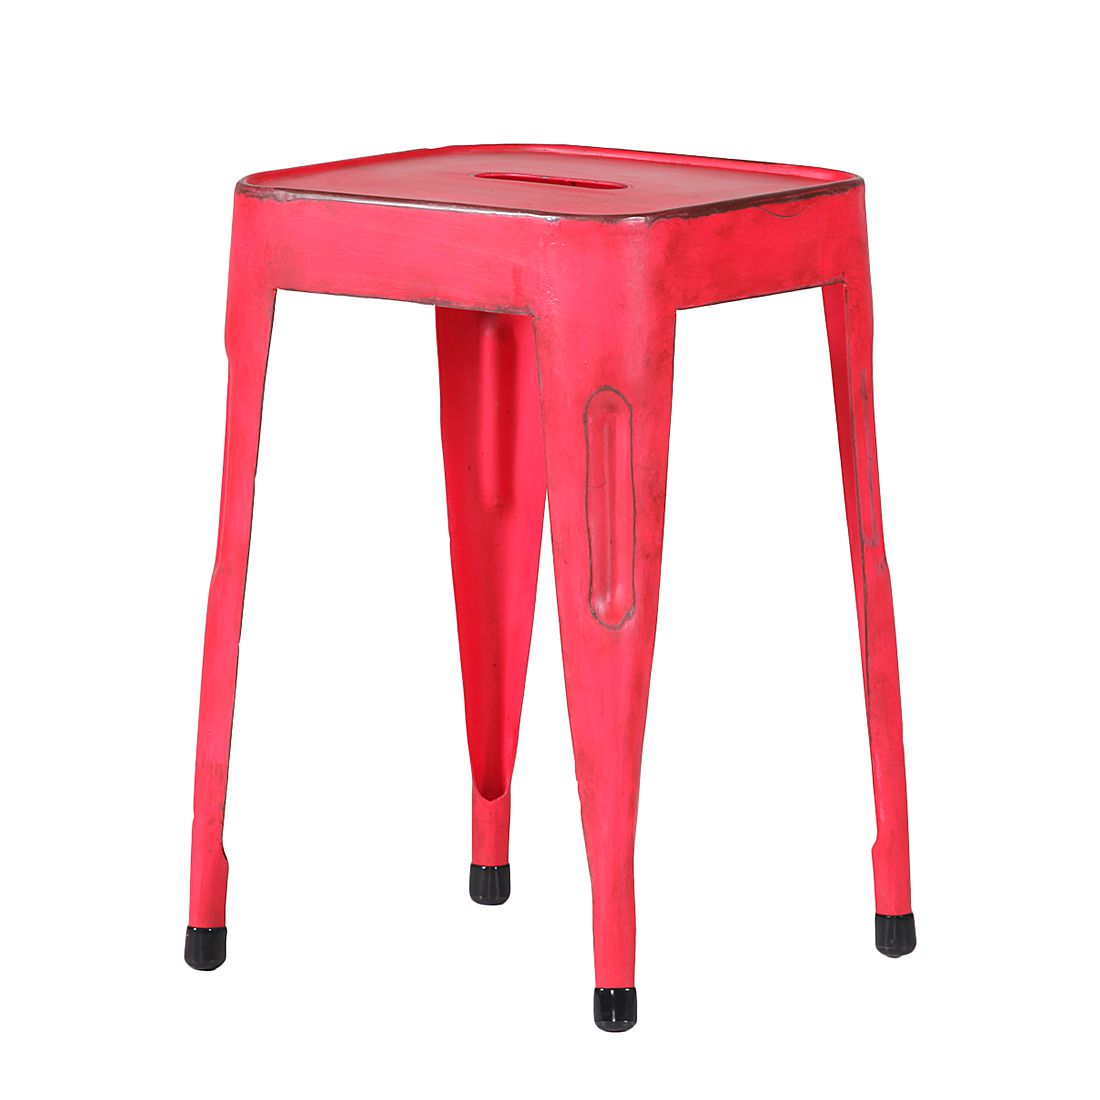 wandbeschlag f r gardinenstange nc89 kyushucon. Black Bedroom Furniture Sets. Home Design Ideas